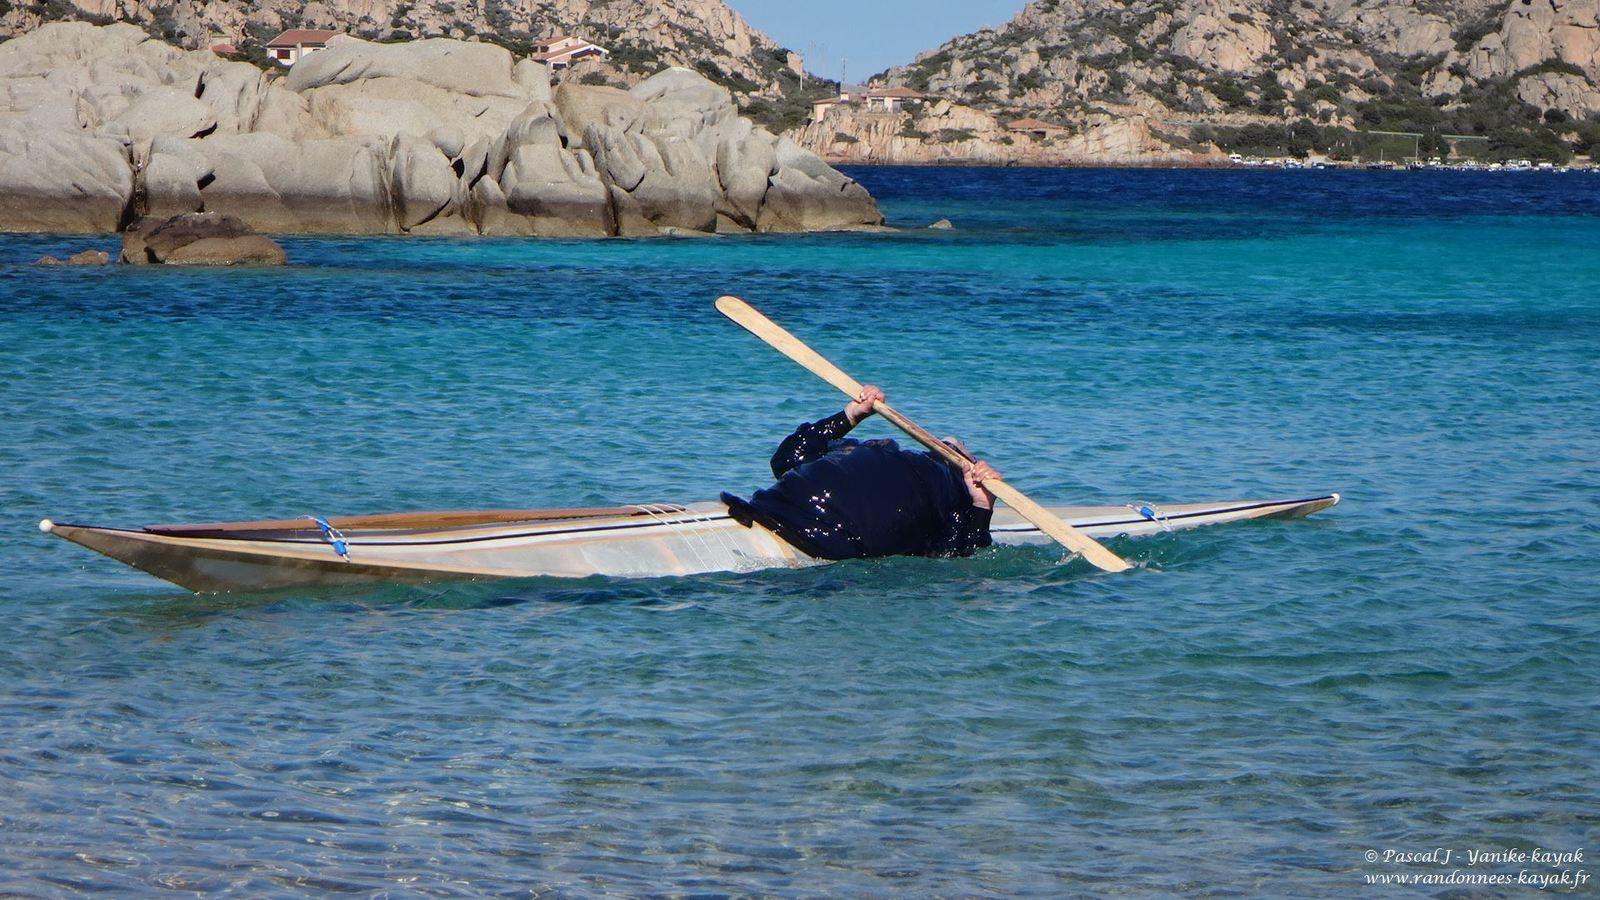 Sardegna 2019, una nuova avventura - Chapitre 12 - Maddalena and rolls